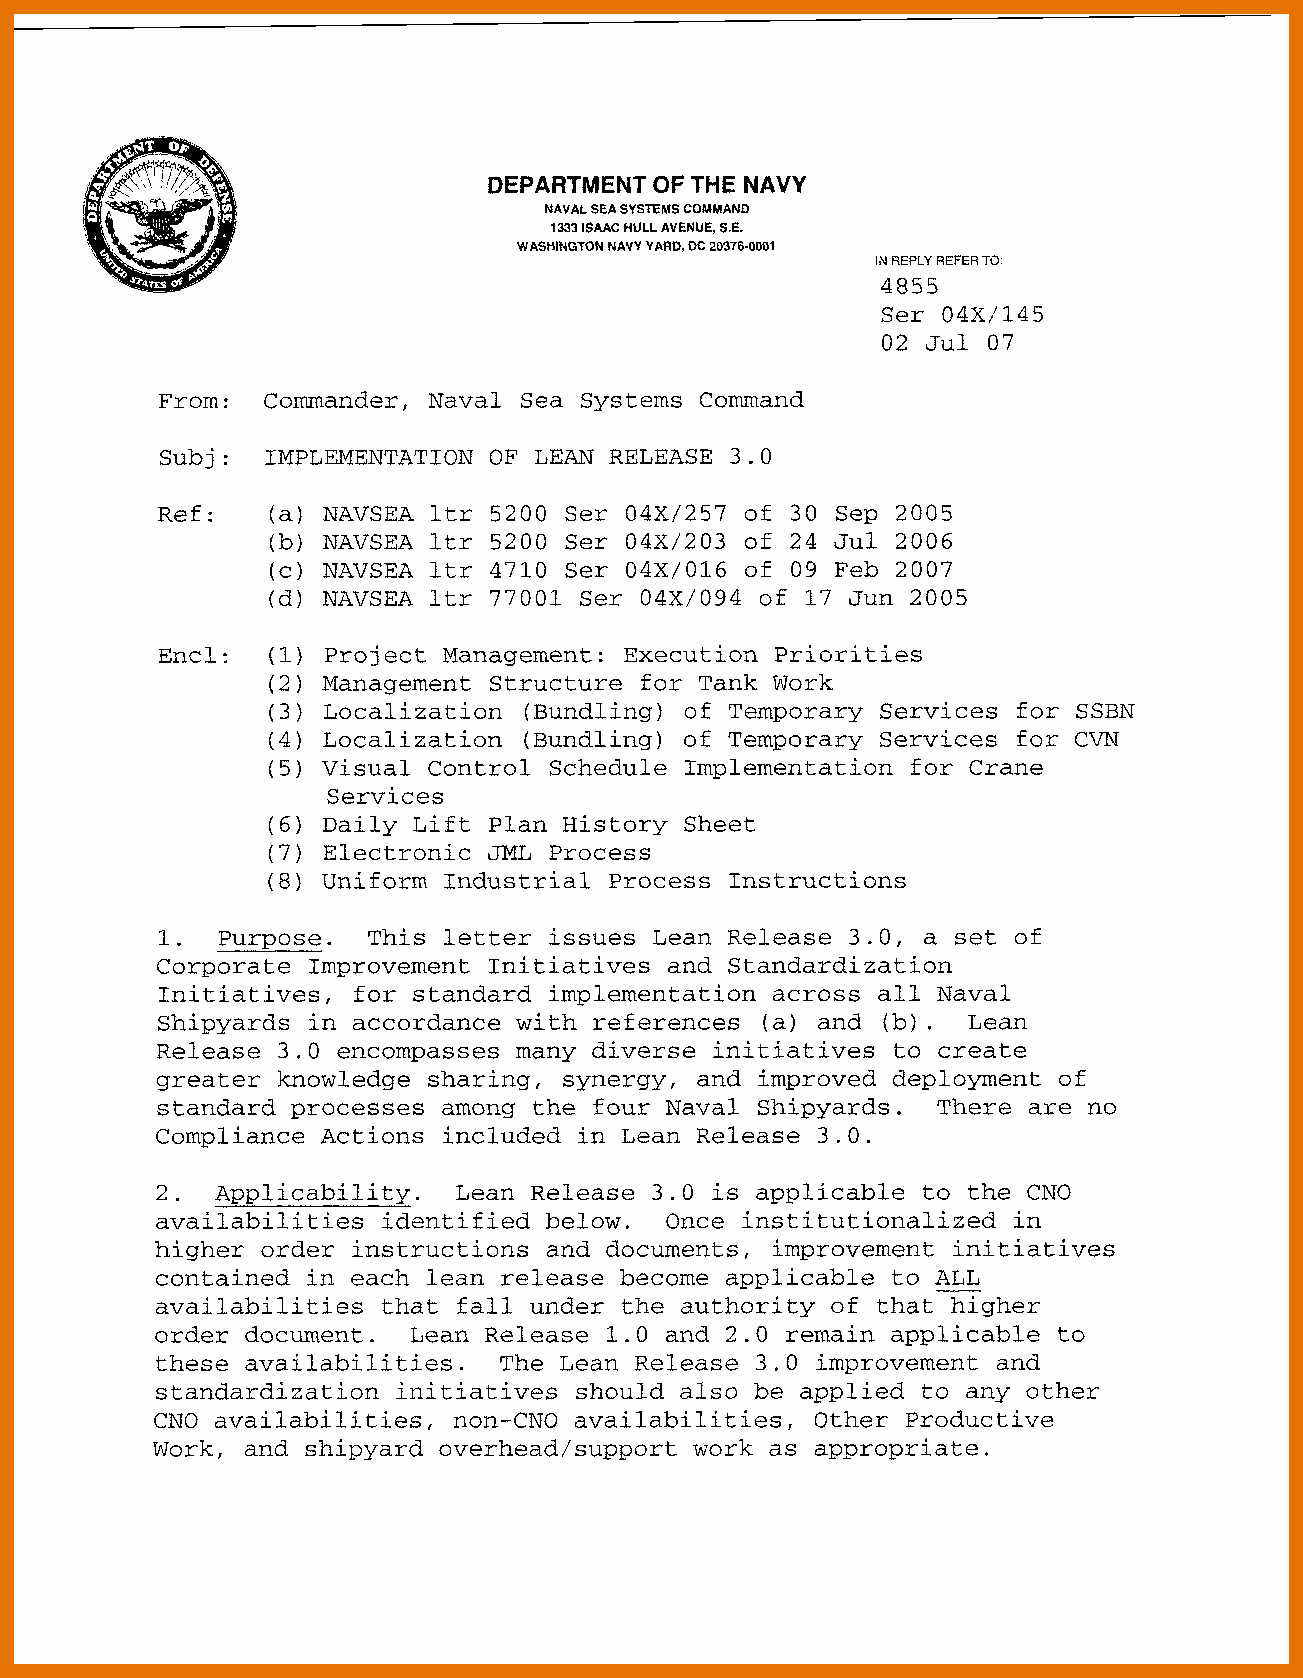 Navy Letter format Template Inspirational 5 6 Naval Letter format